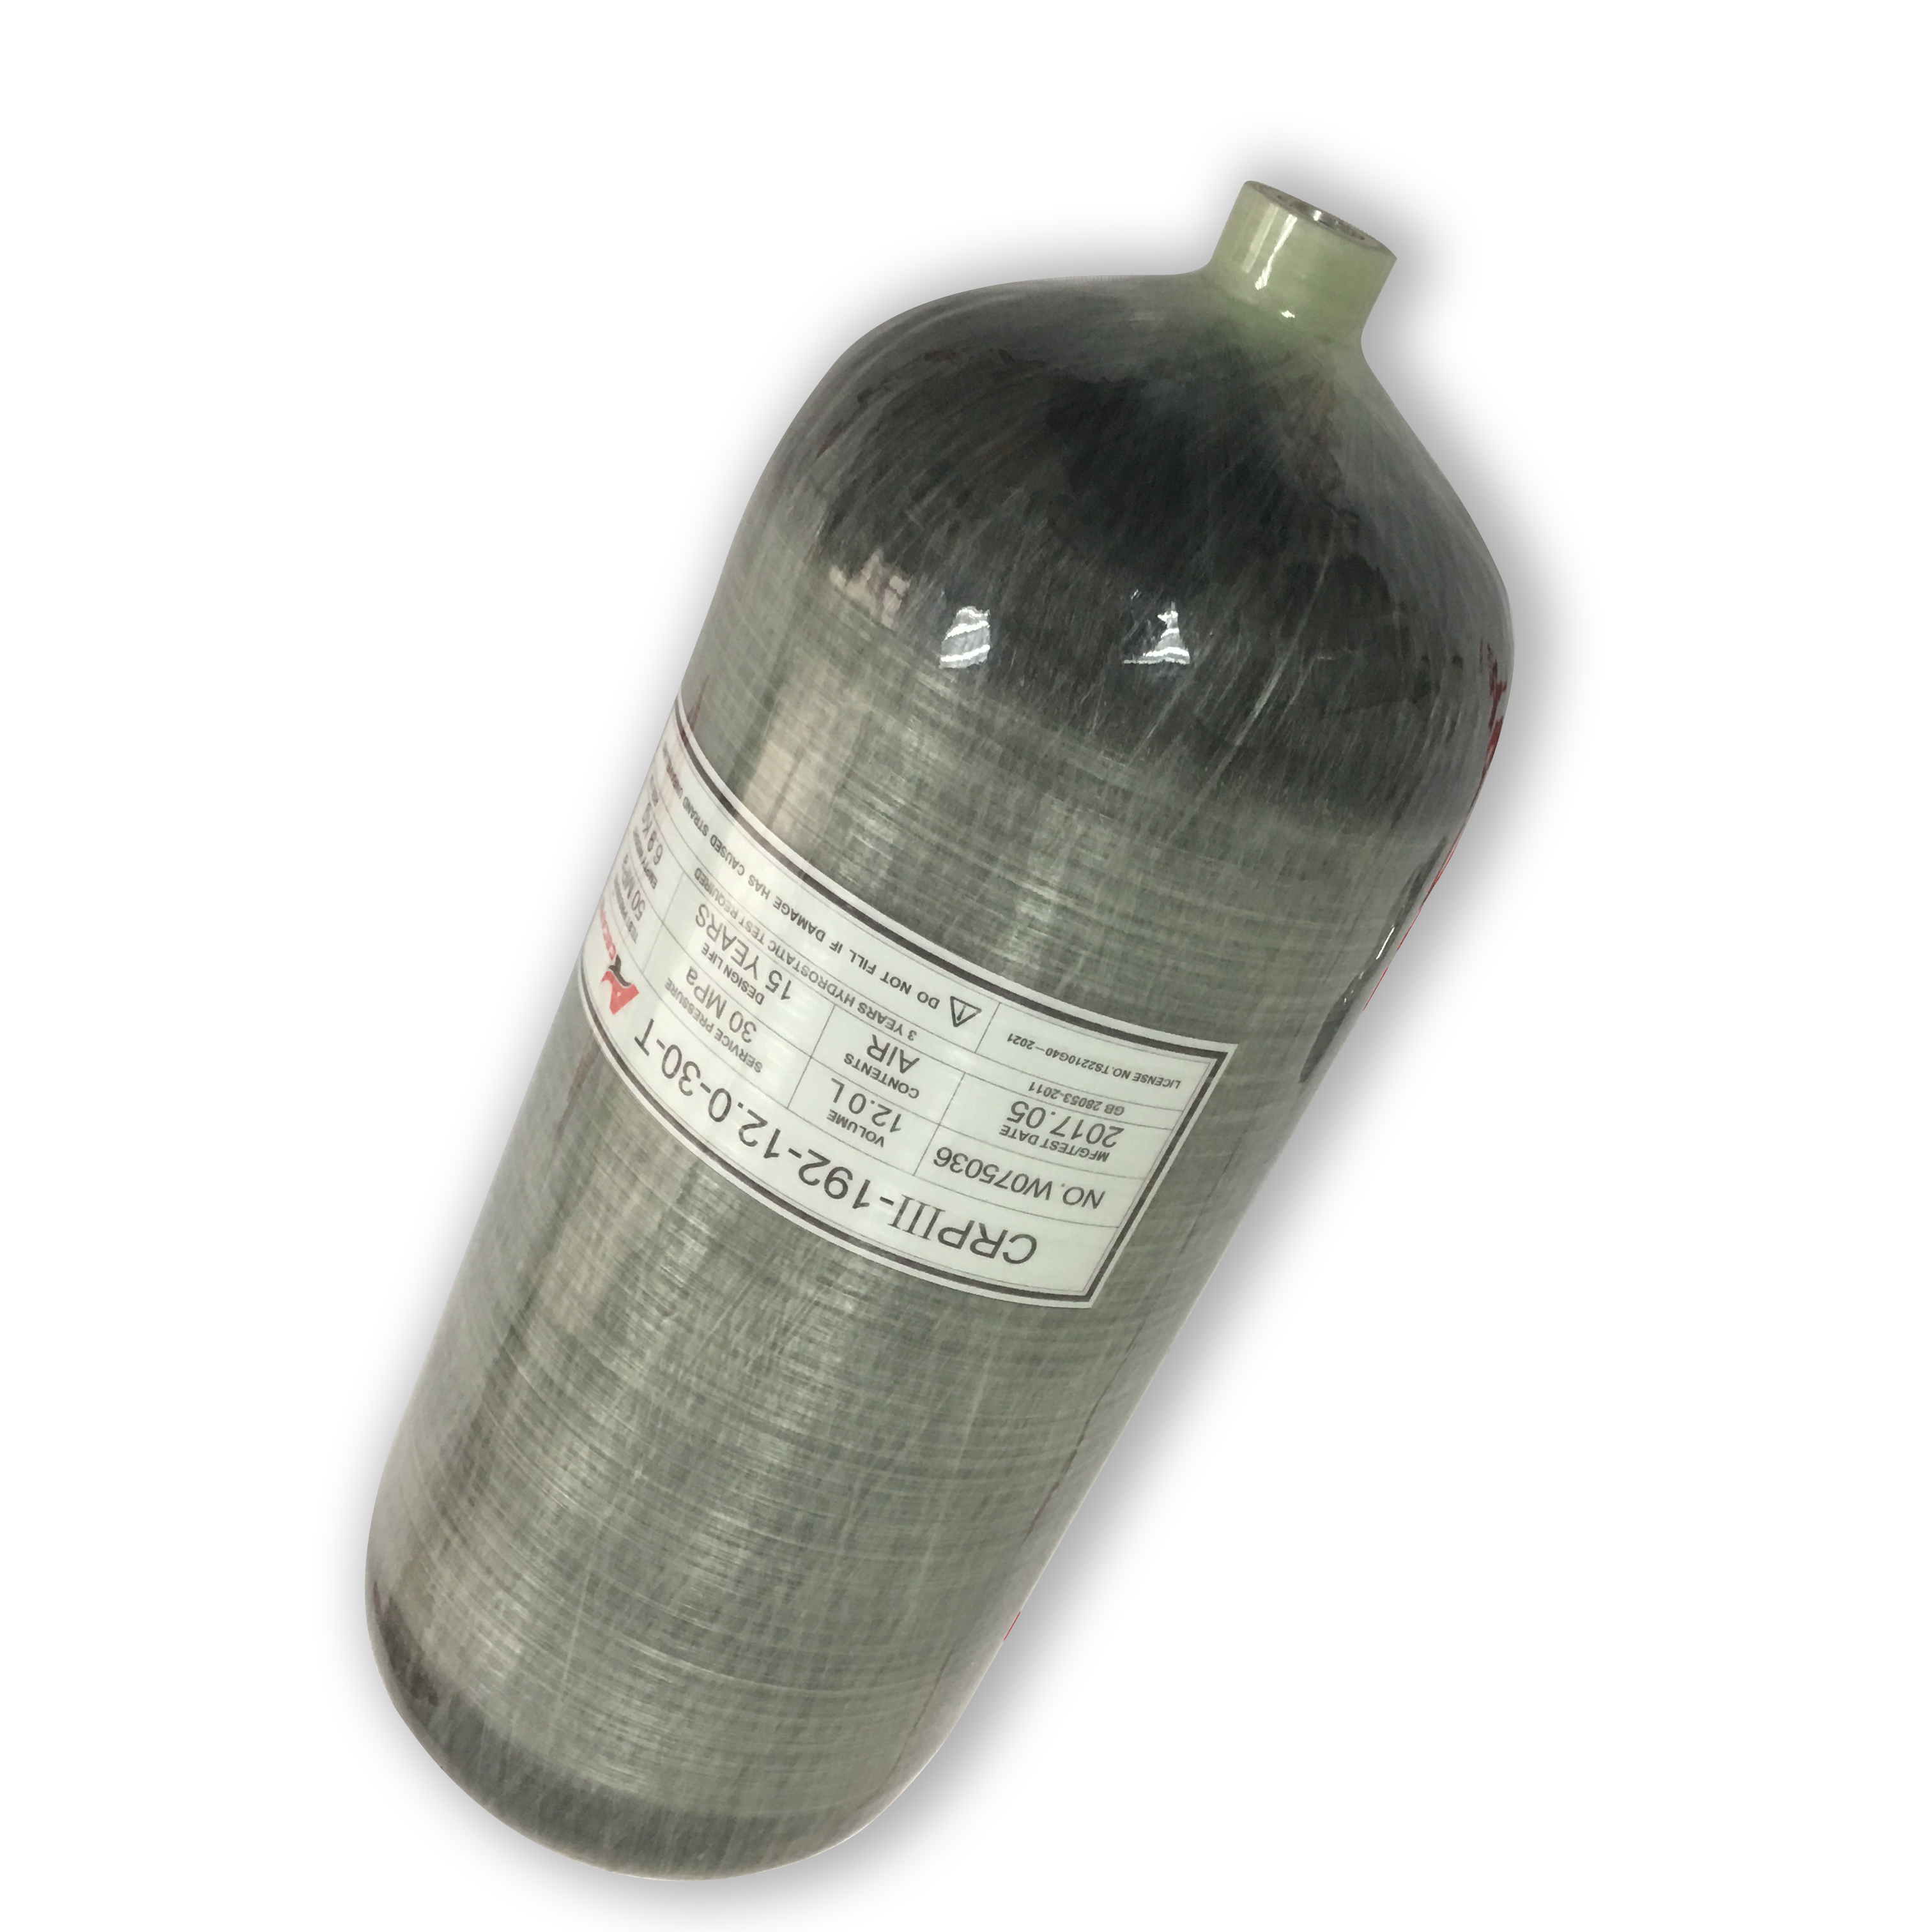 AC3102 12L airforce condor pcp cylindre haute pression pour plongée respiration paintball scba 4500psi/300bar 2019 ACECARE